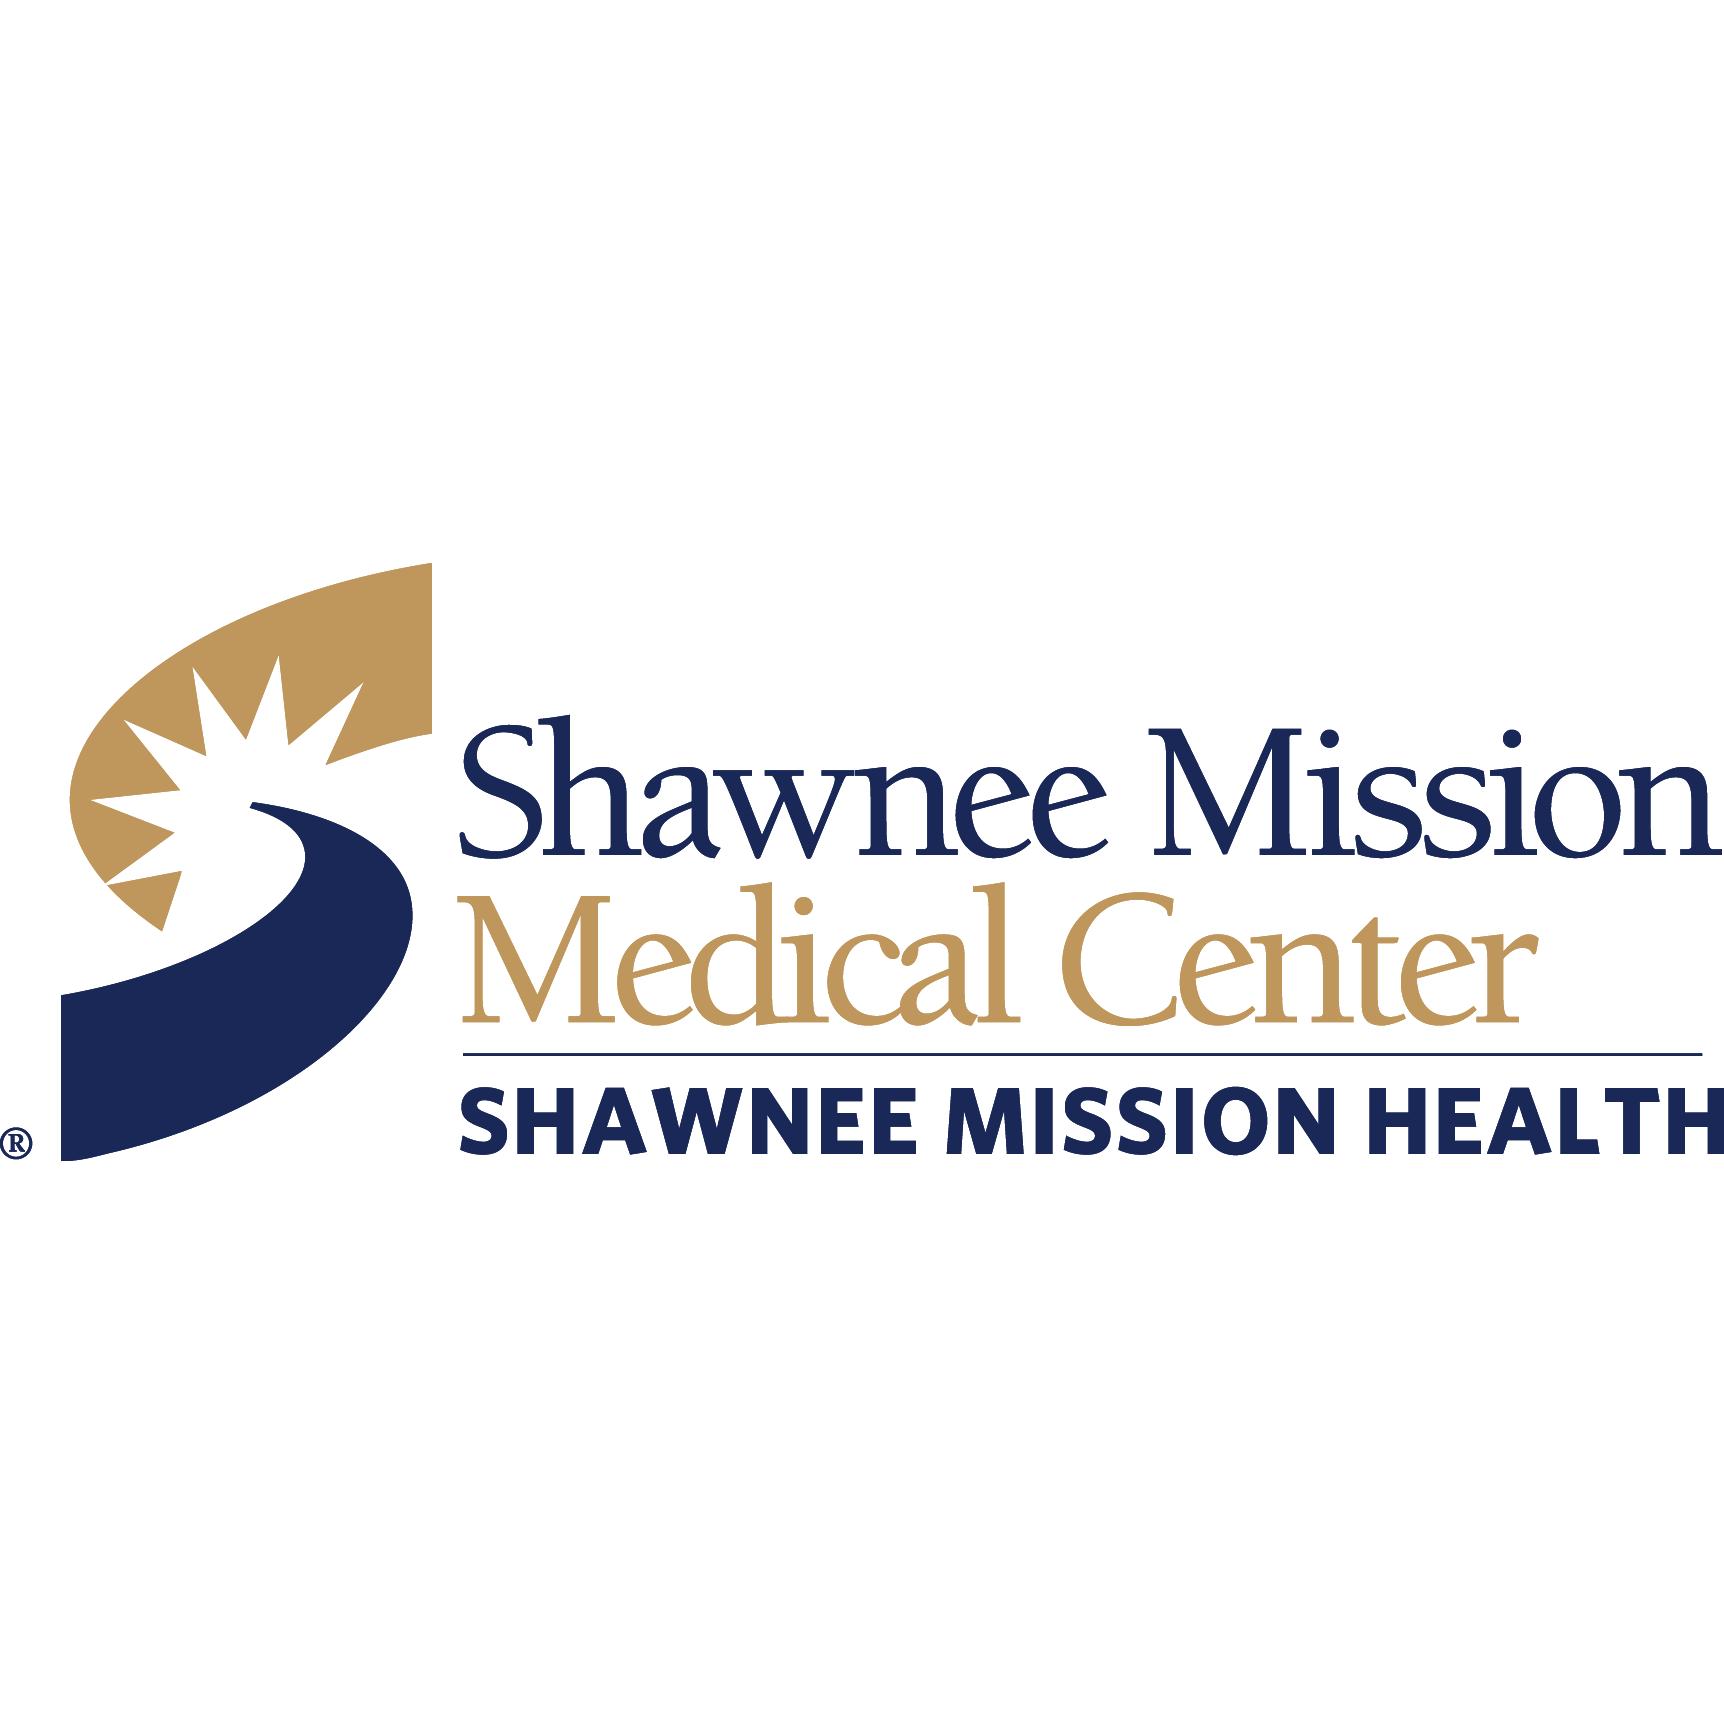 Shawnee Mission Health - Shawnee Mission Medical Center image 0